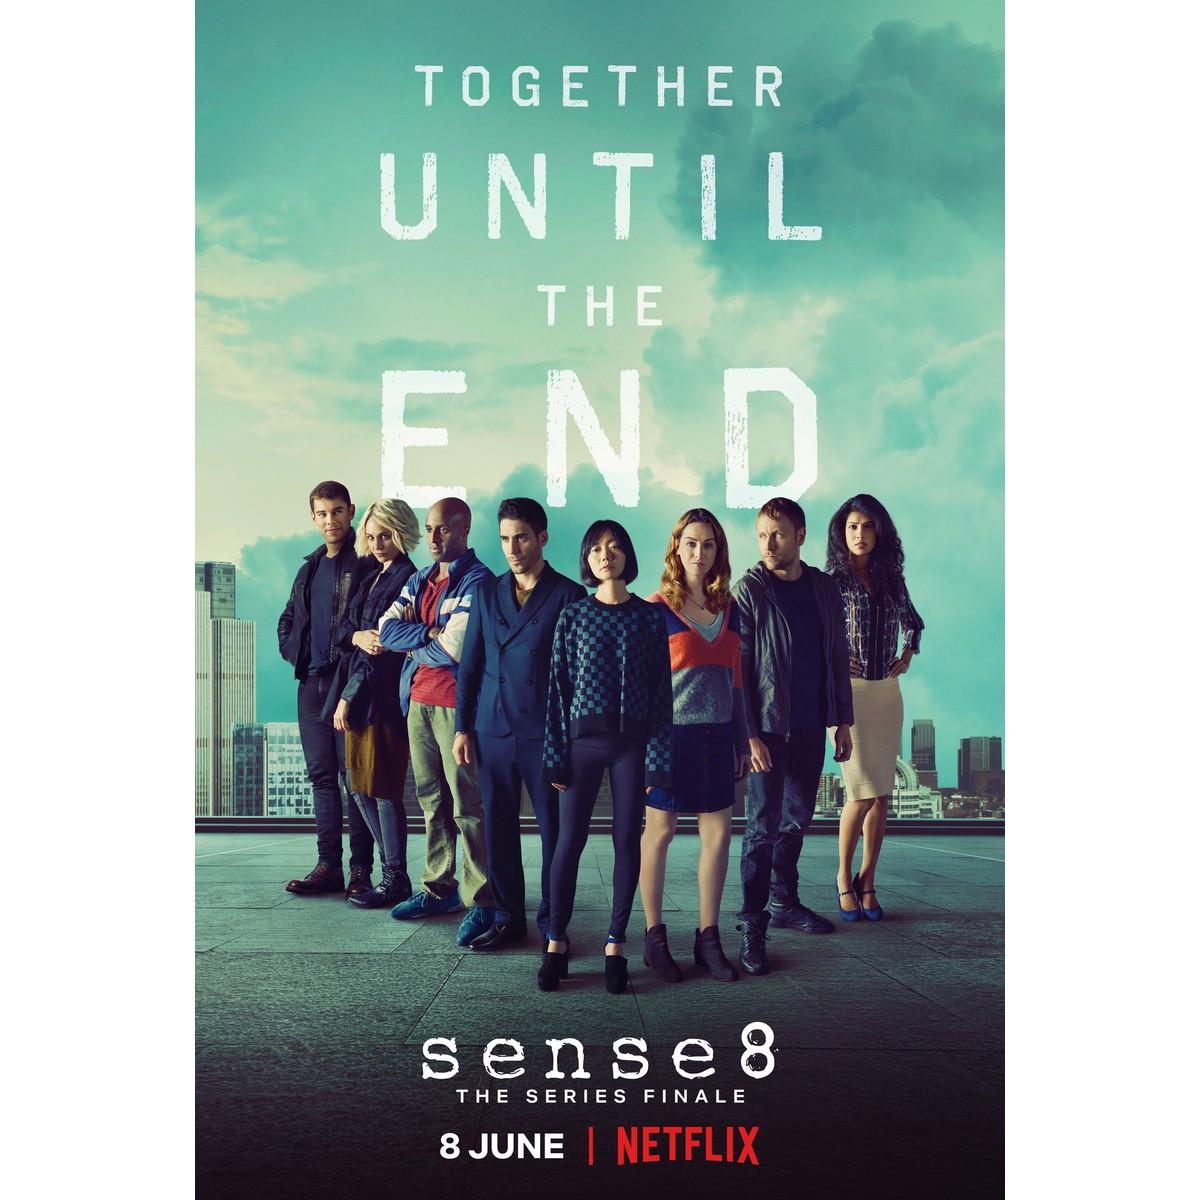 Svod n°1 - Sense8 intégral